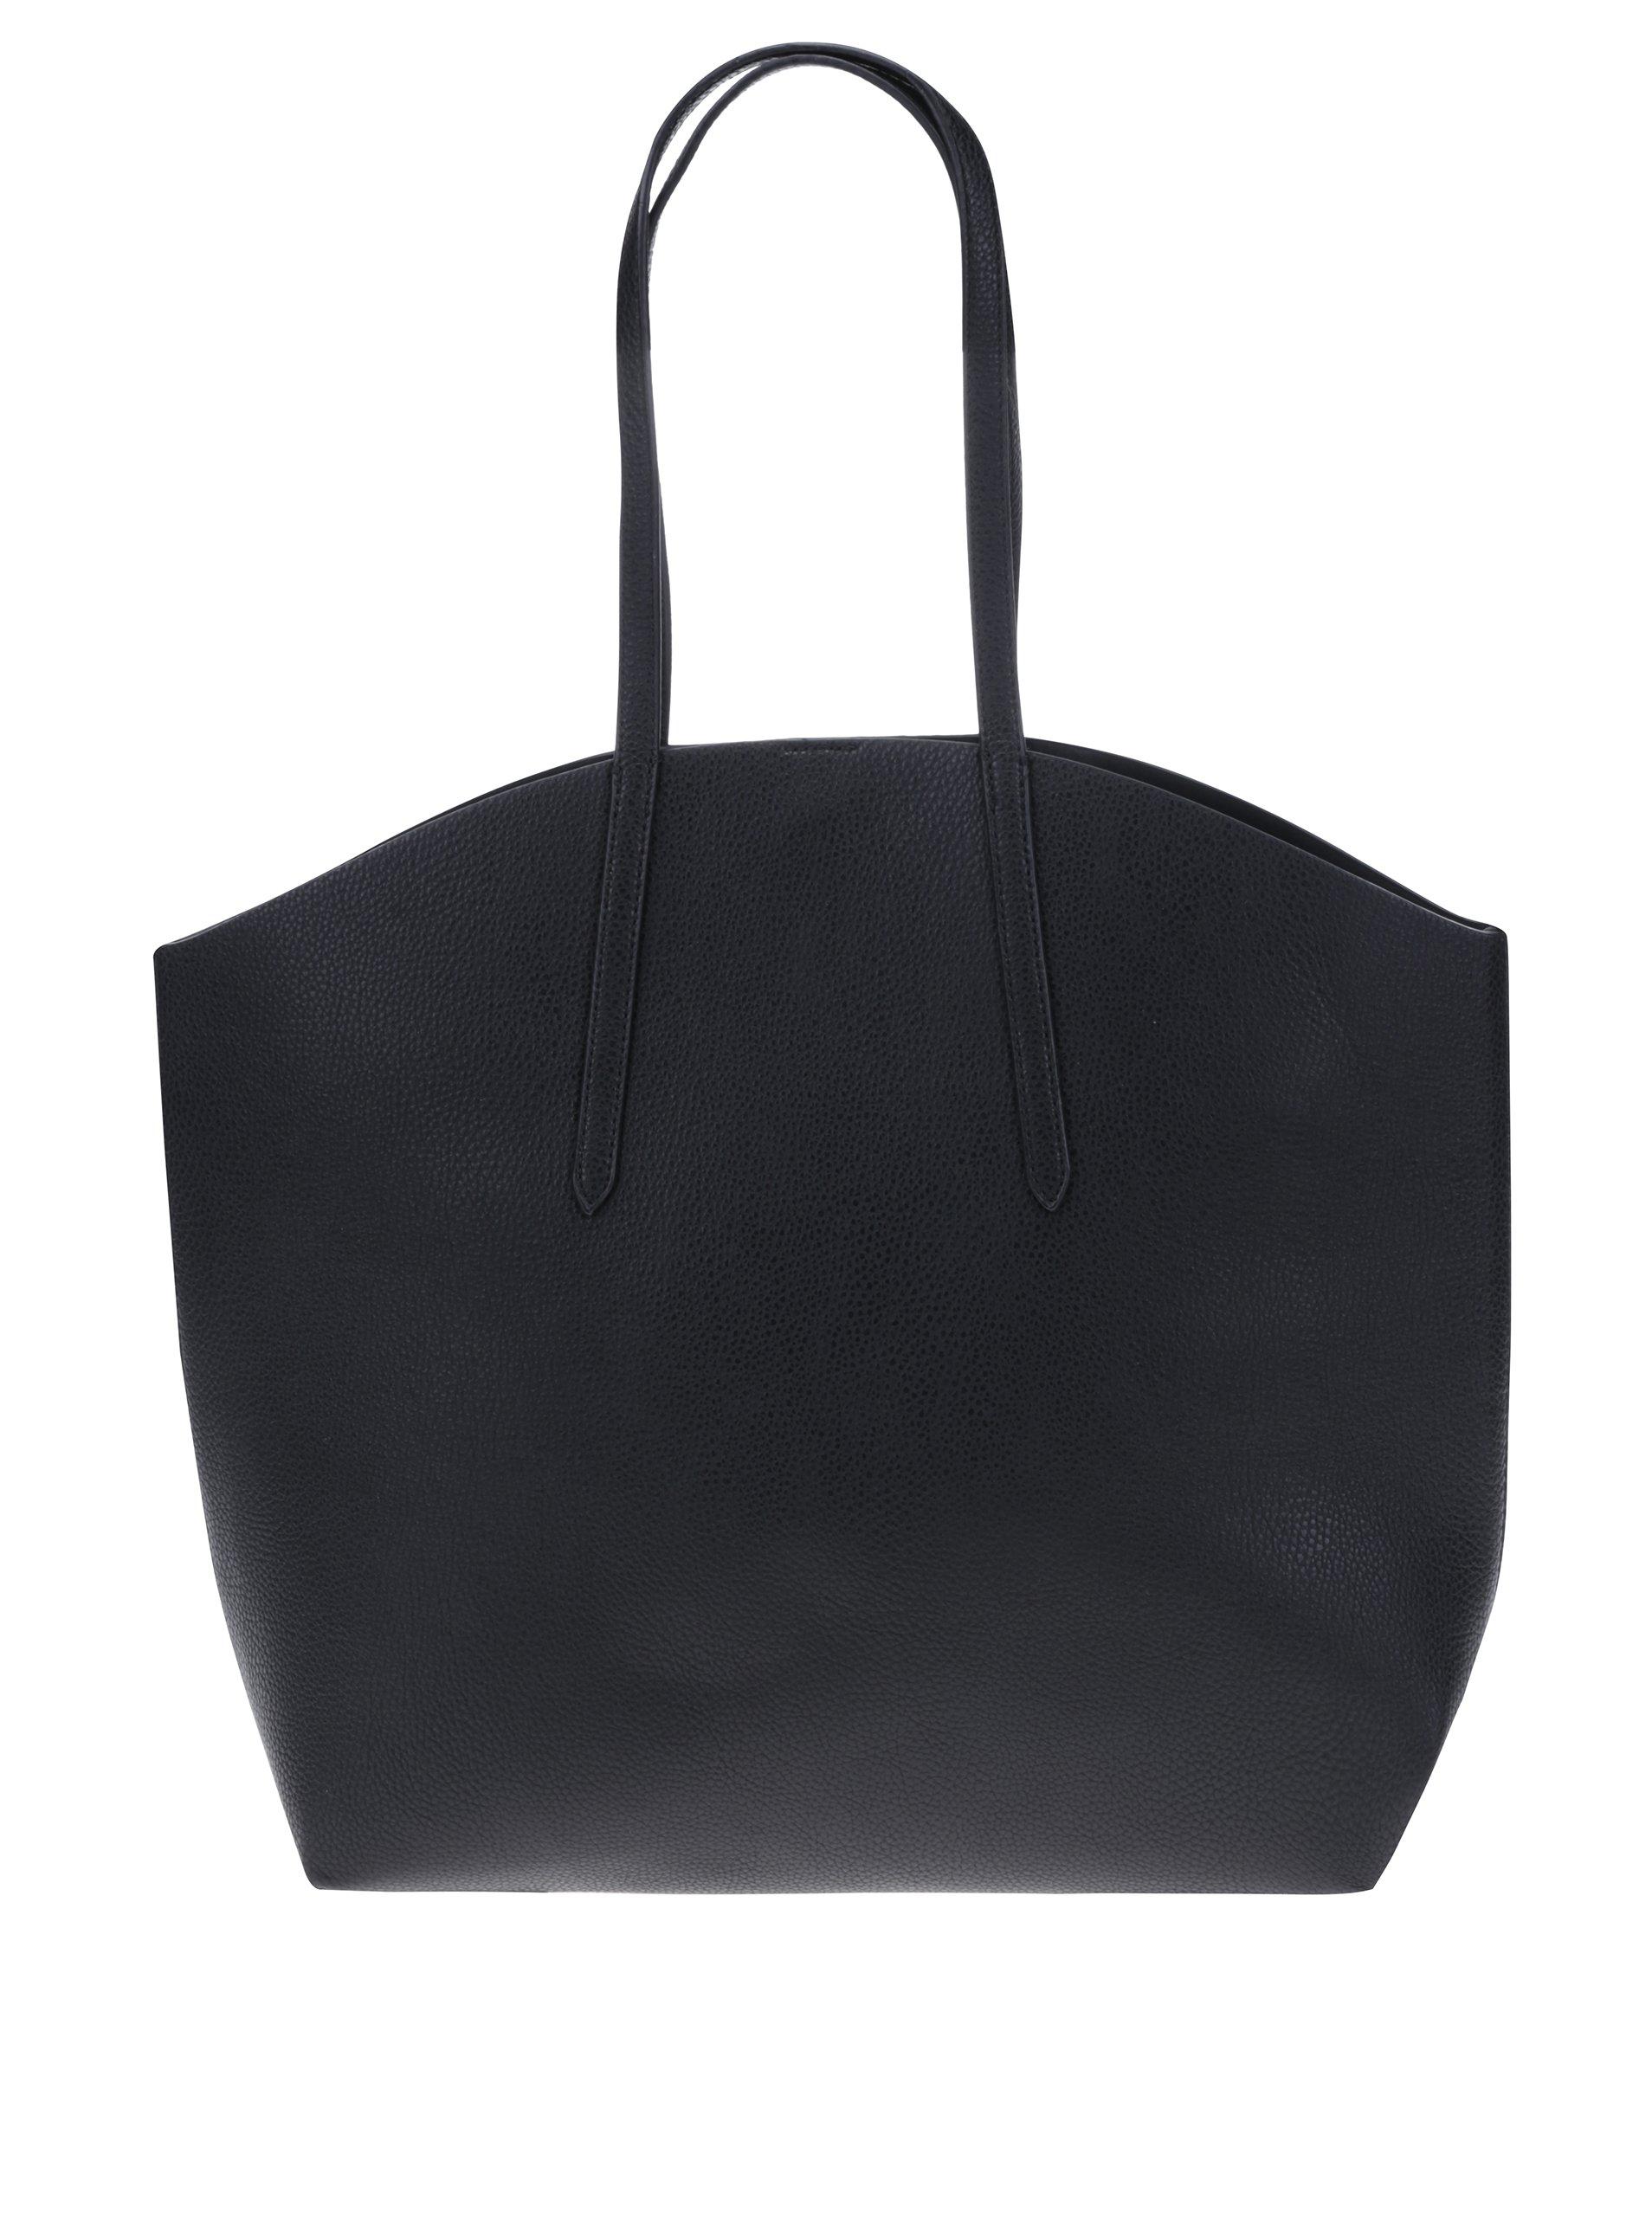 Černý oboustranný shopper Pieces Noella